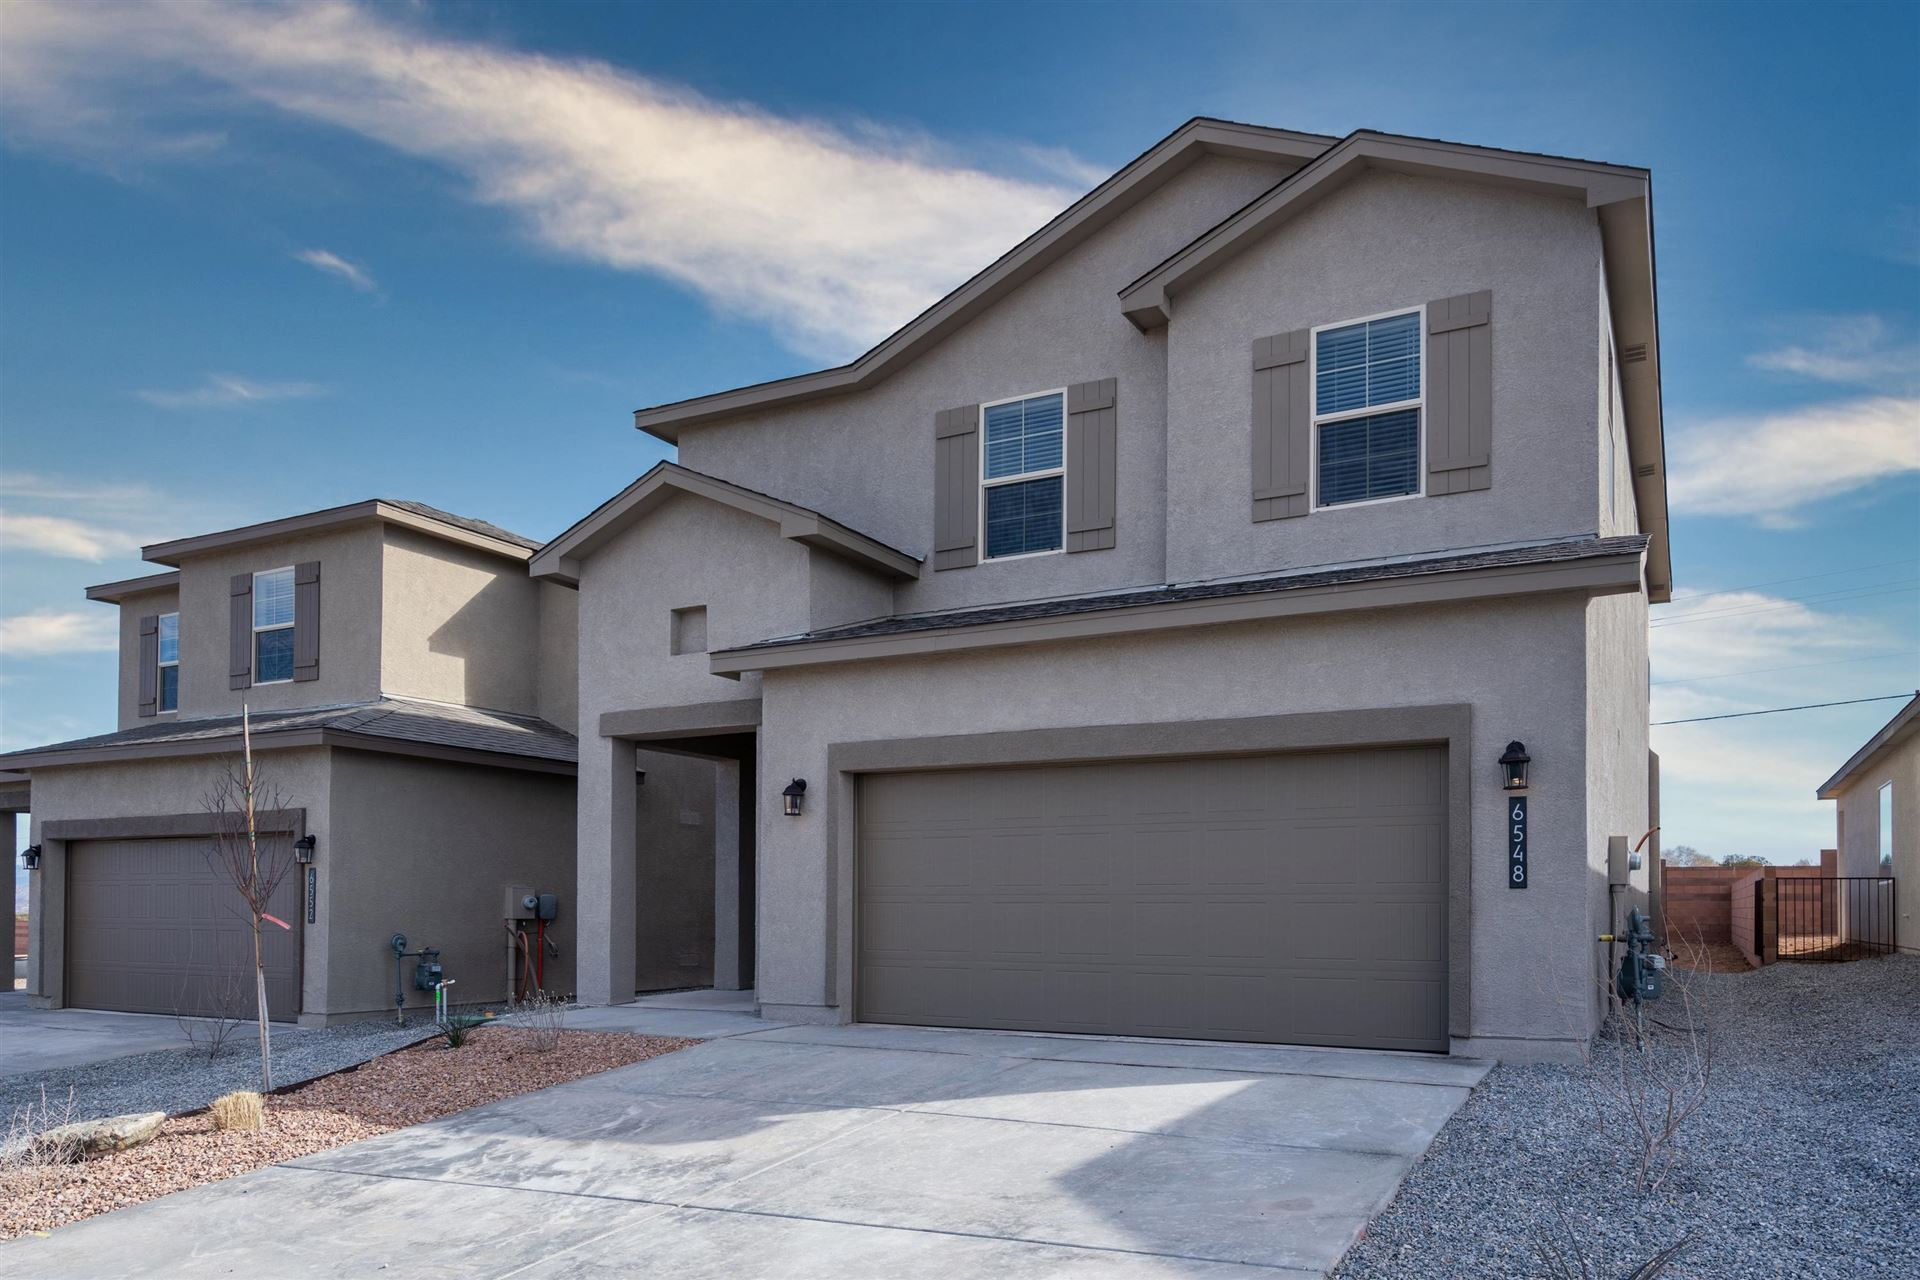 Photo of 4843 Blackburn Road NE, Rio Rancho, NM 87144 (MLS # 988739)